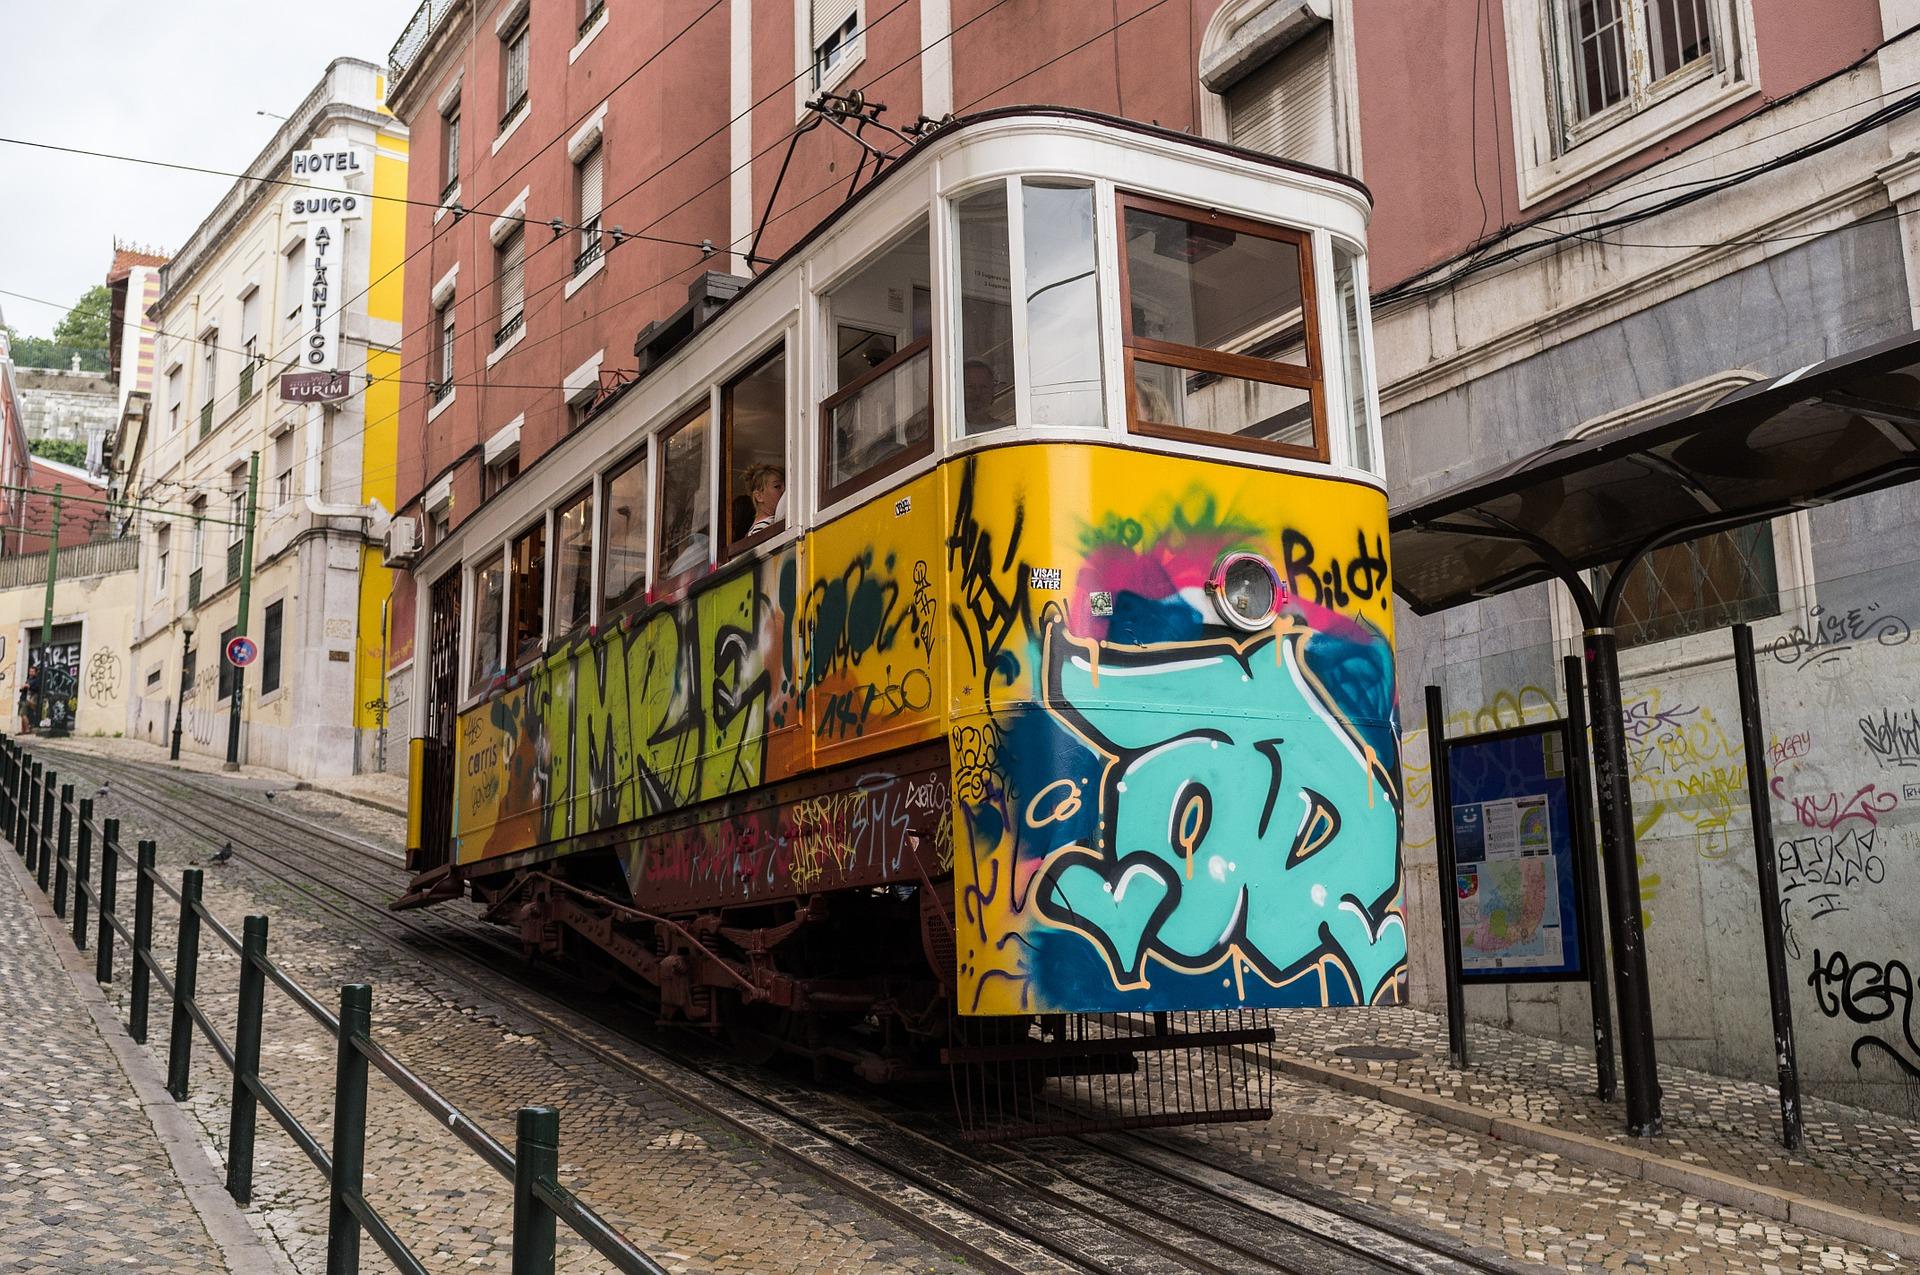 Tram track photo